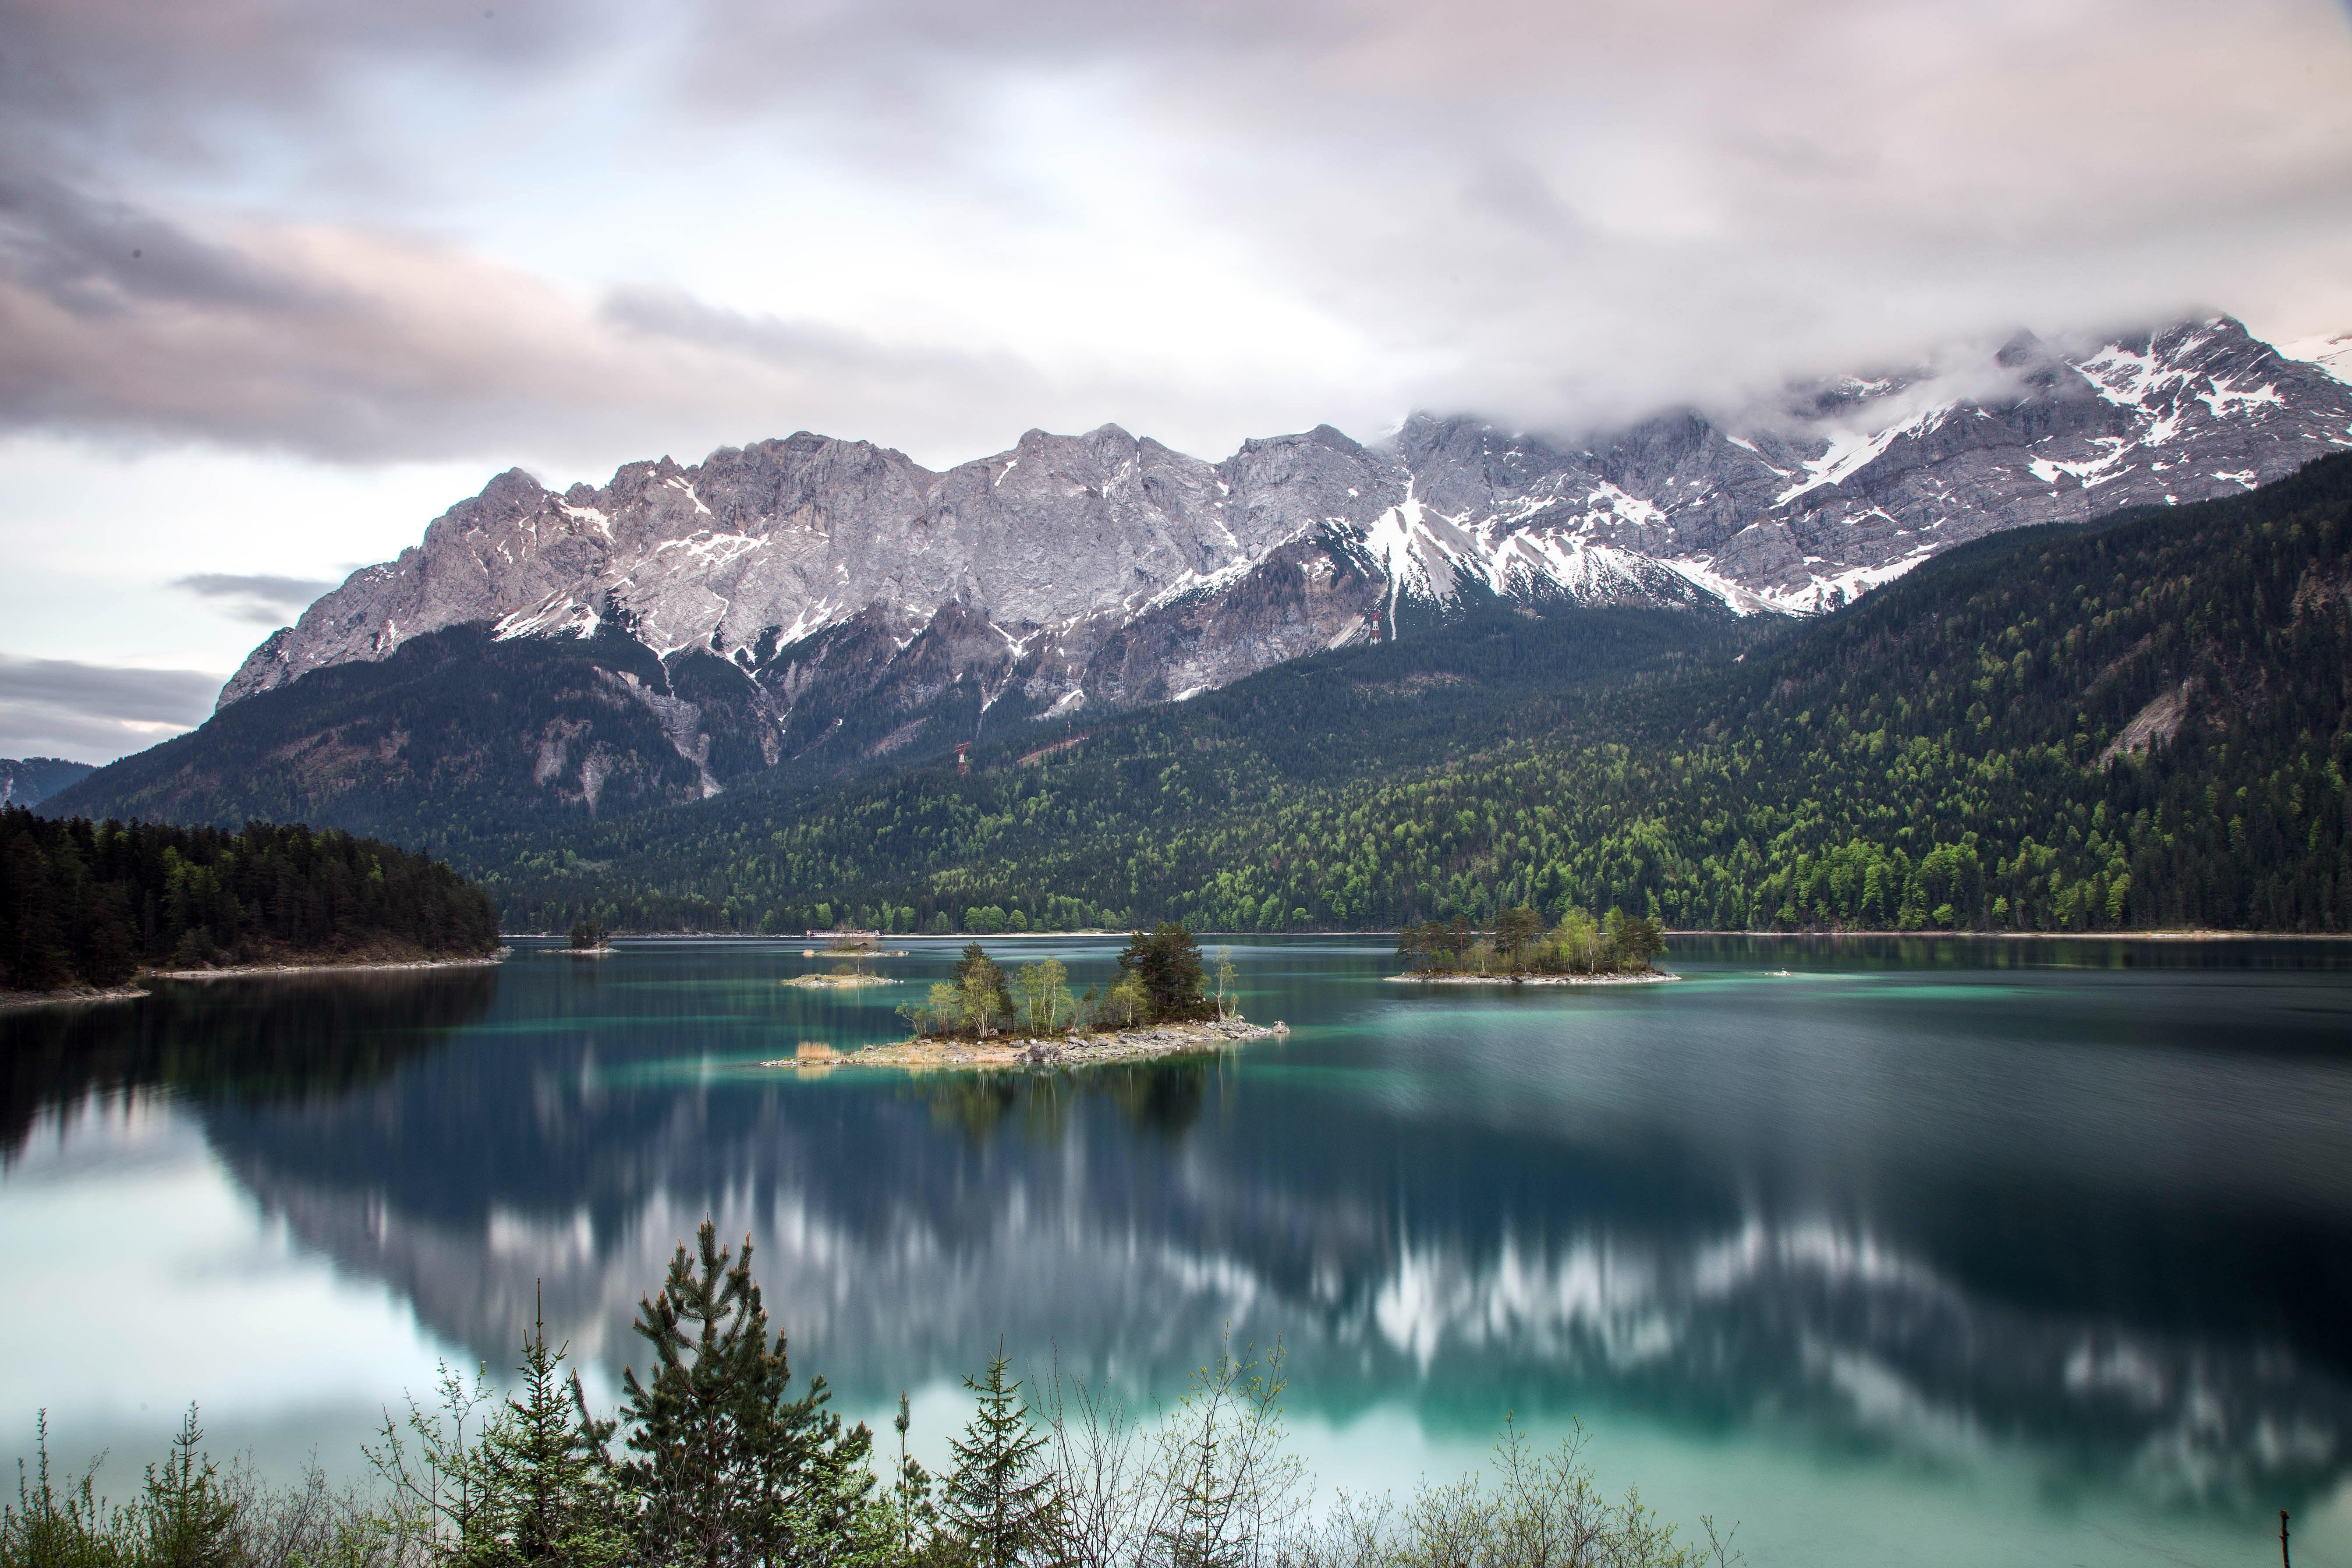 photo of grey mountain across blue lake